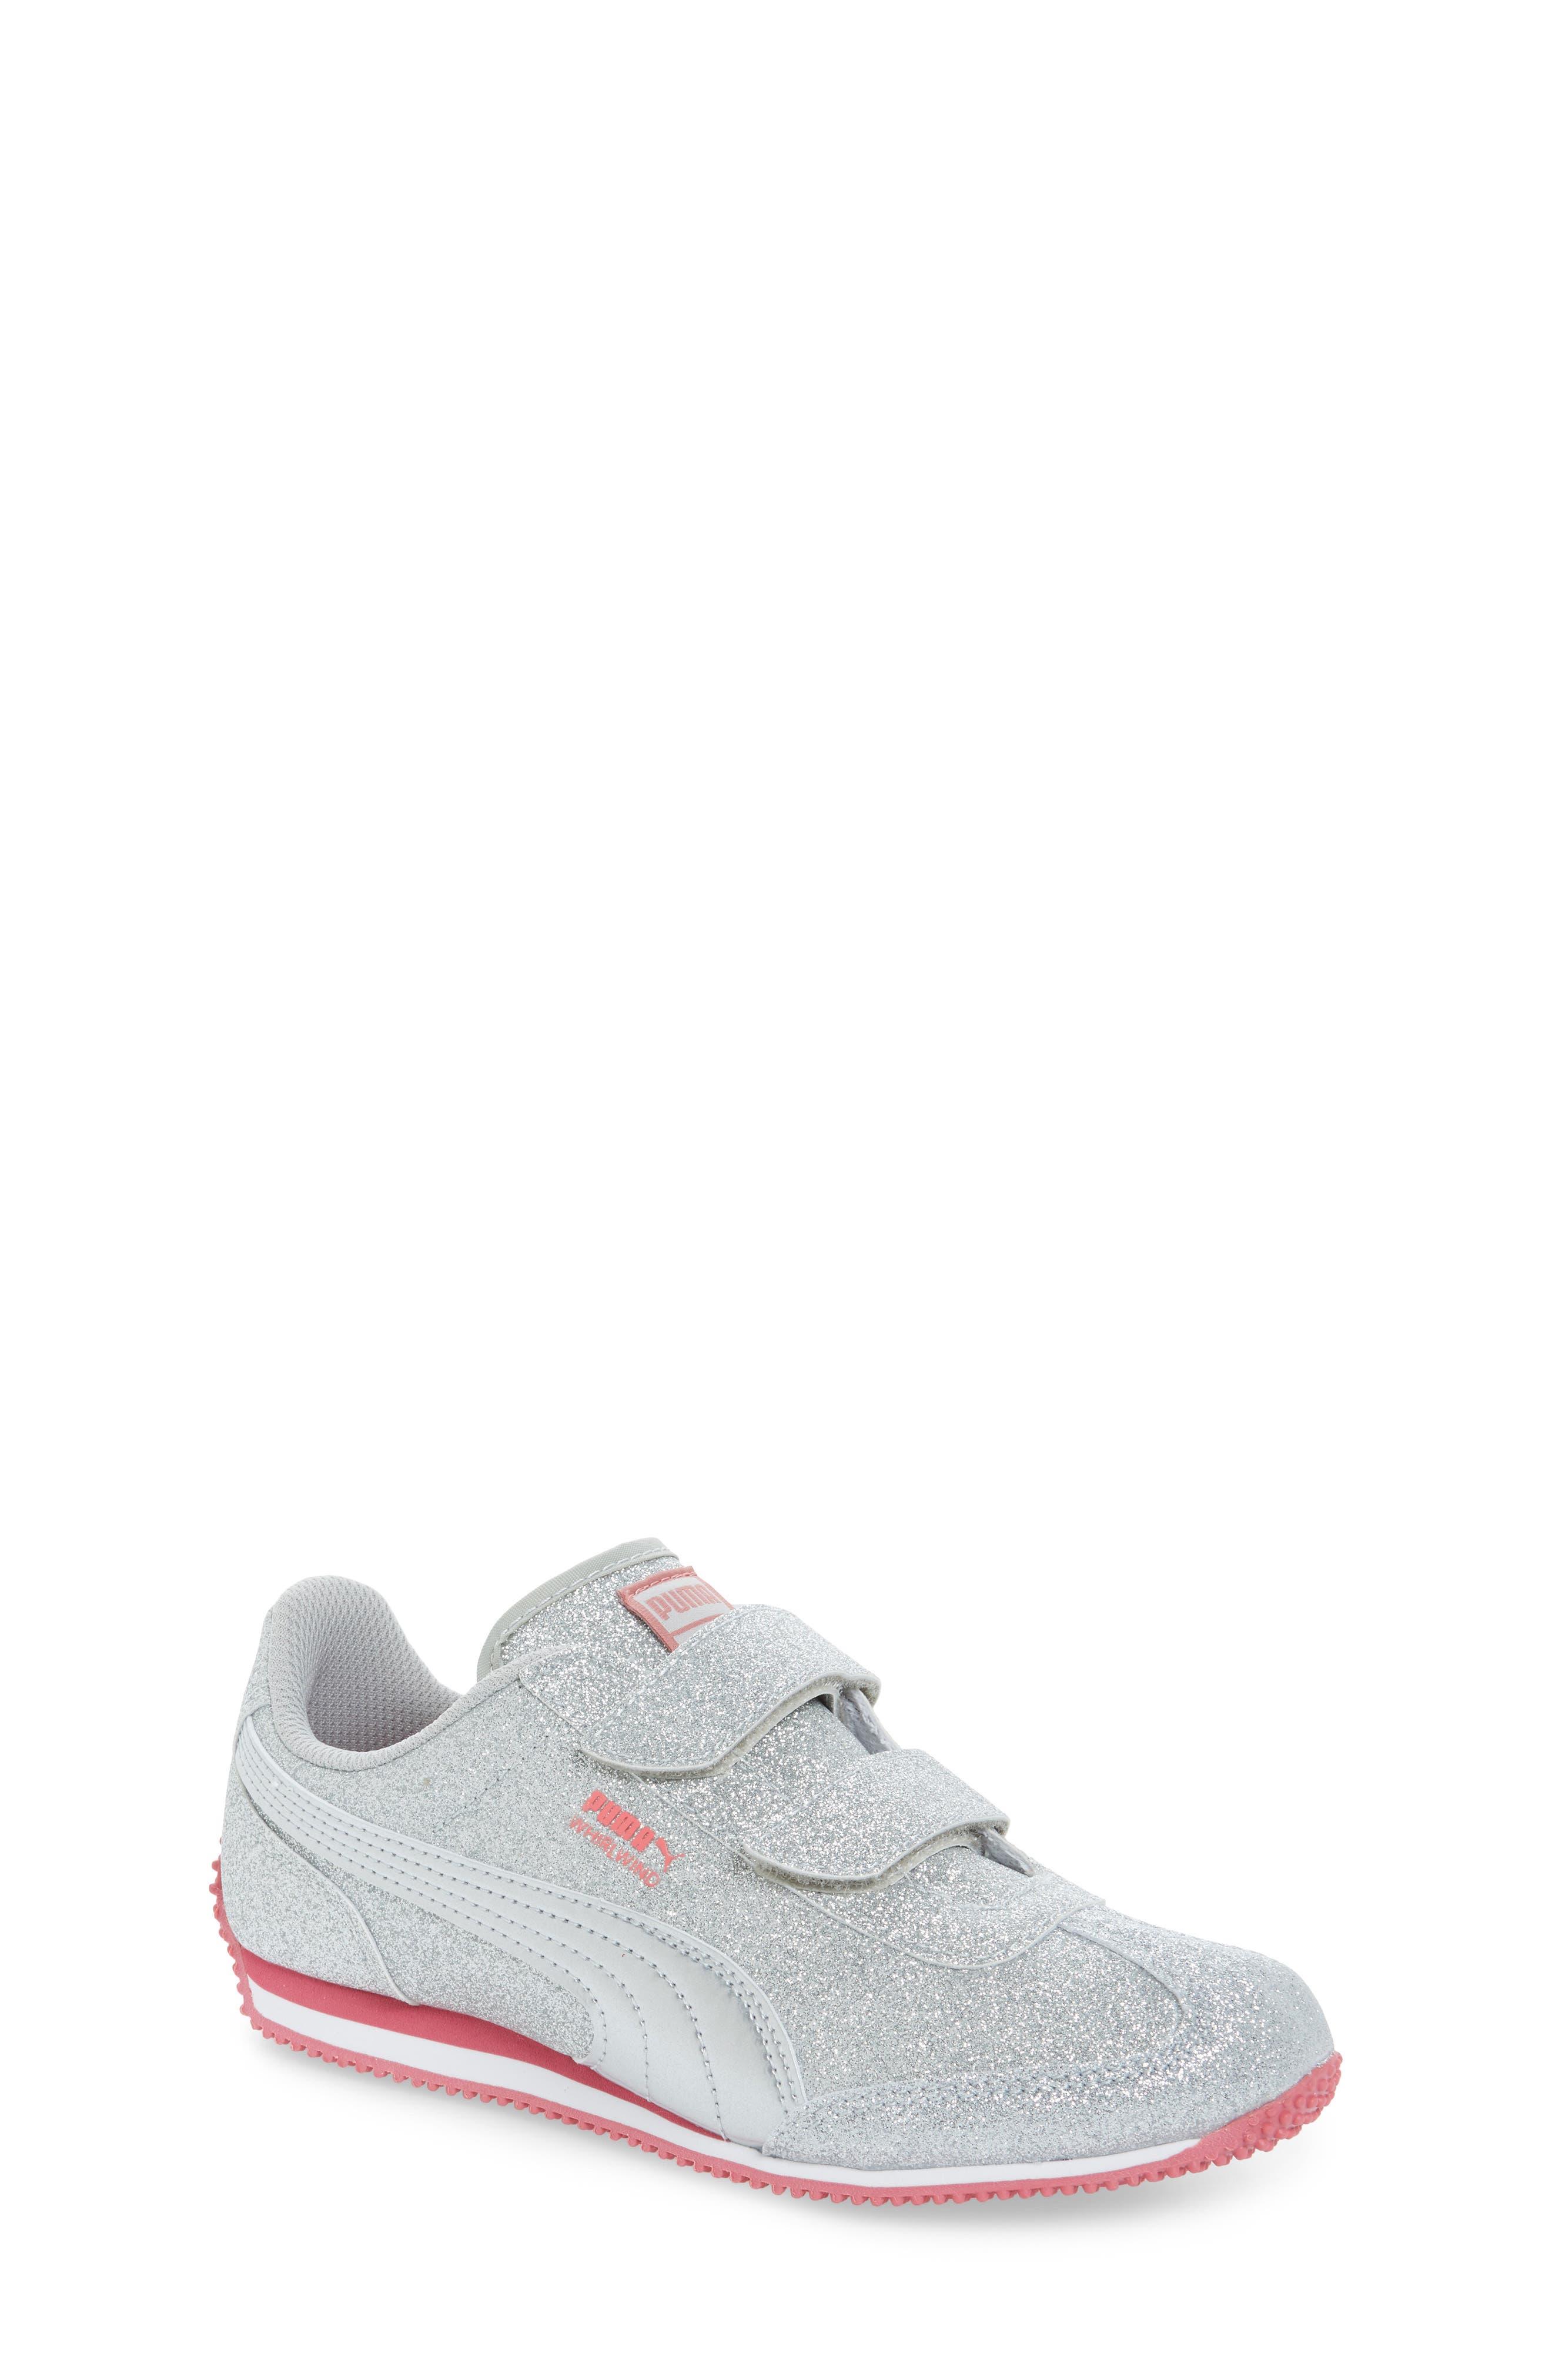 Whirlwind Glitz Sneaker,                             Main thumbnail 1, color,                             040